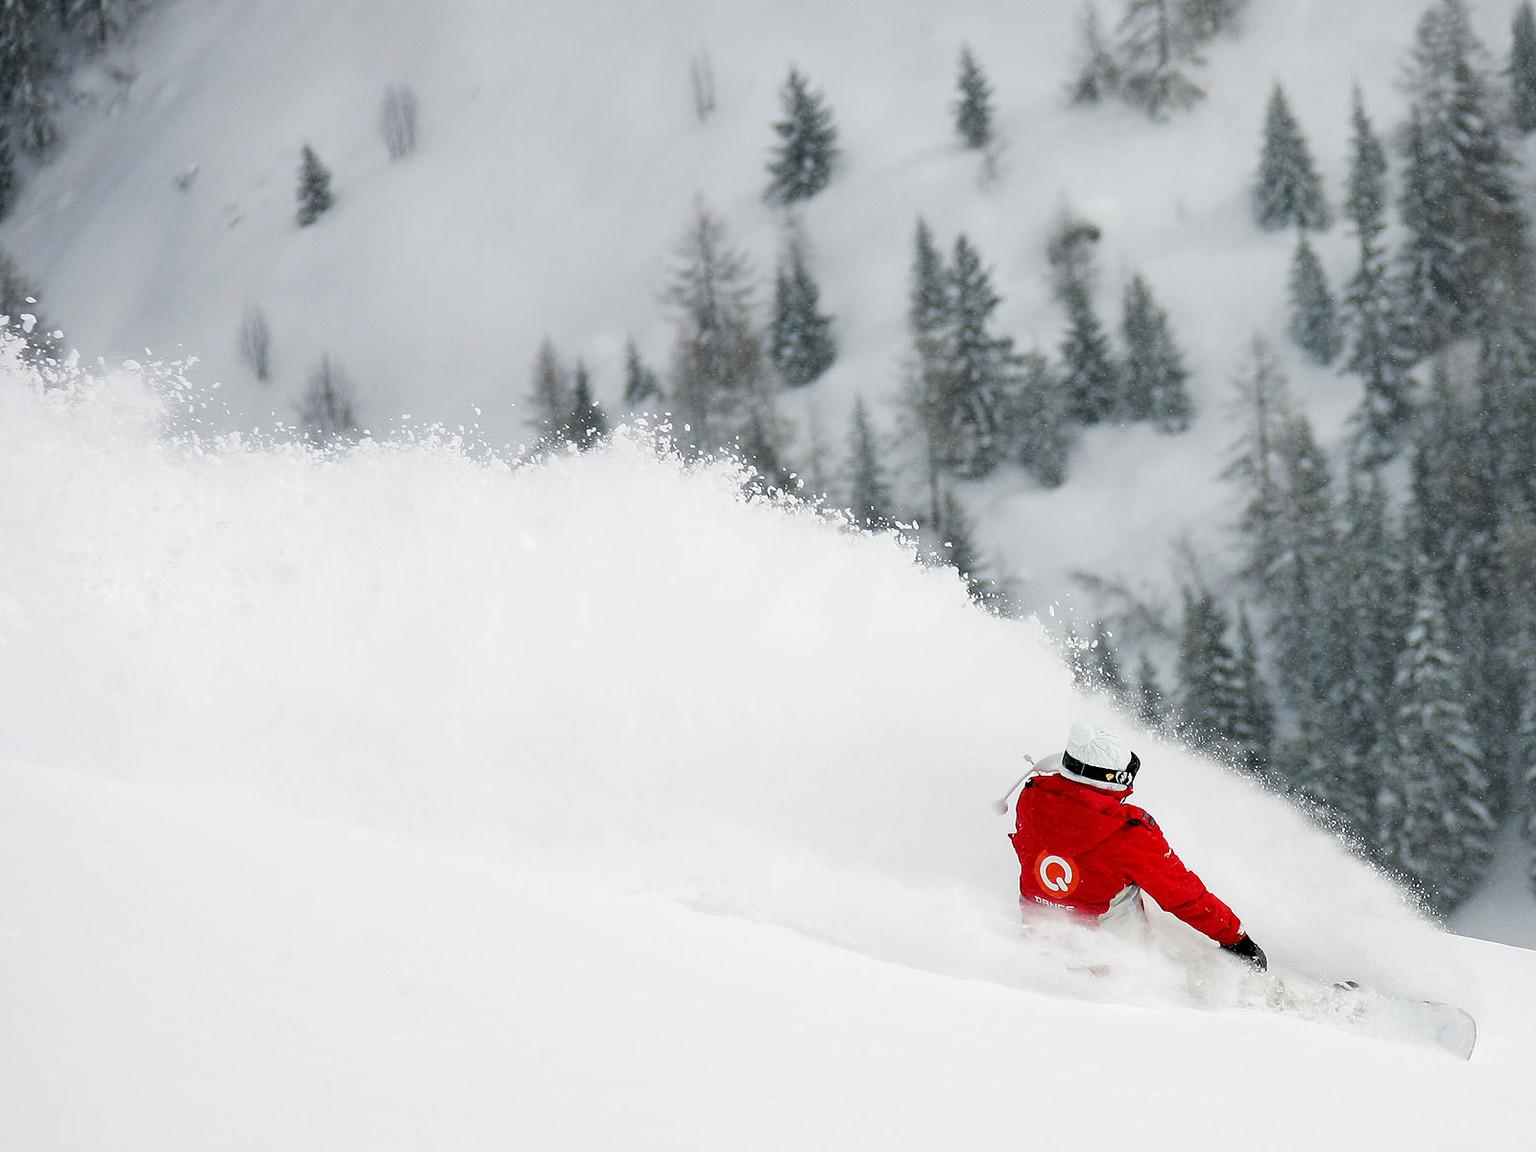 ws_Winter_Olympics_Snowboarder_1600x1200